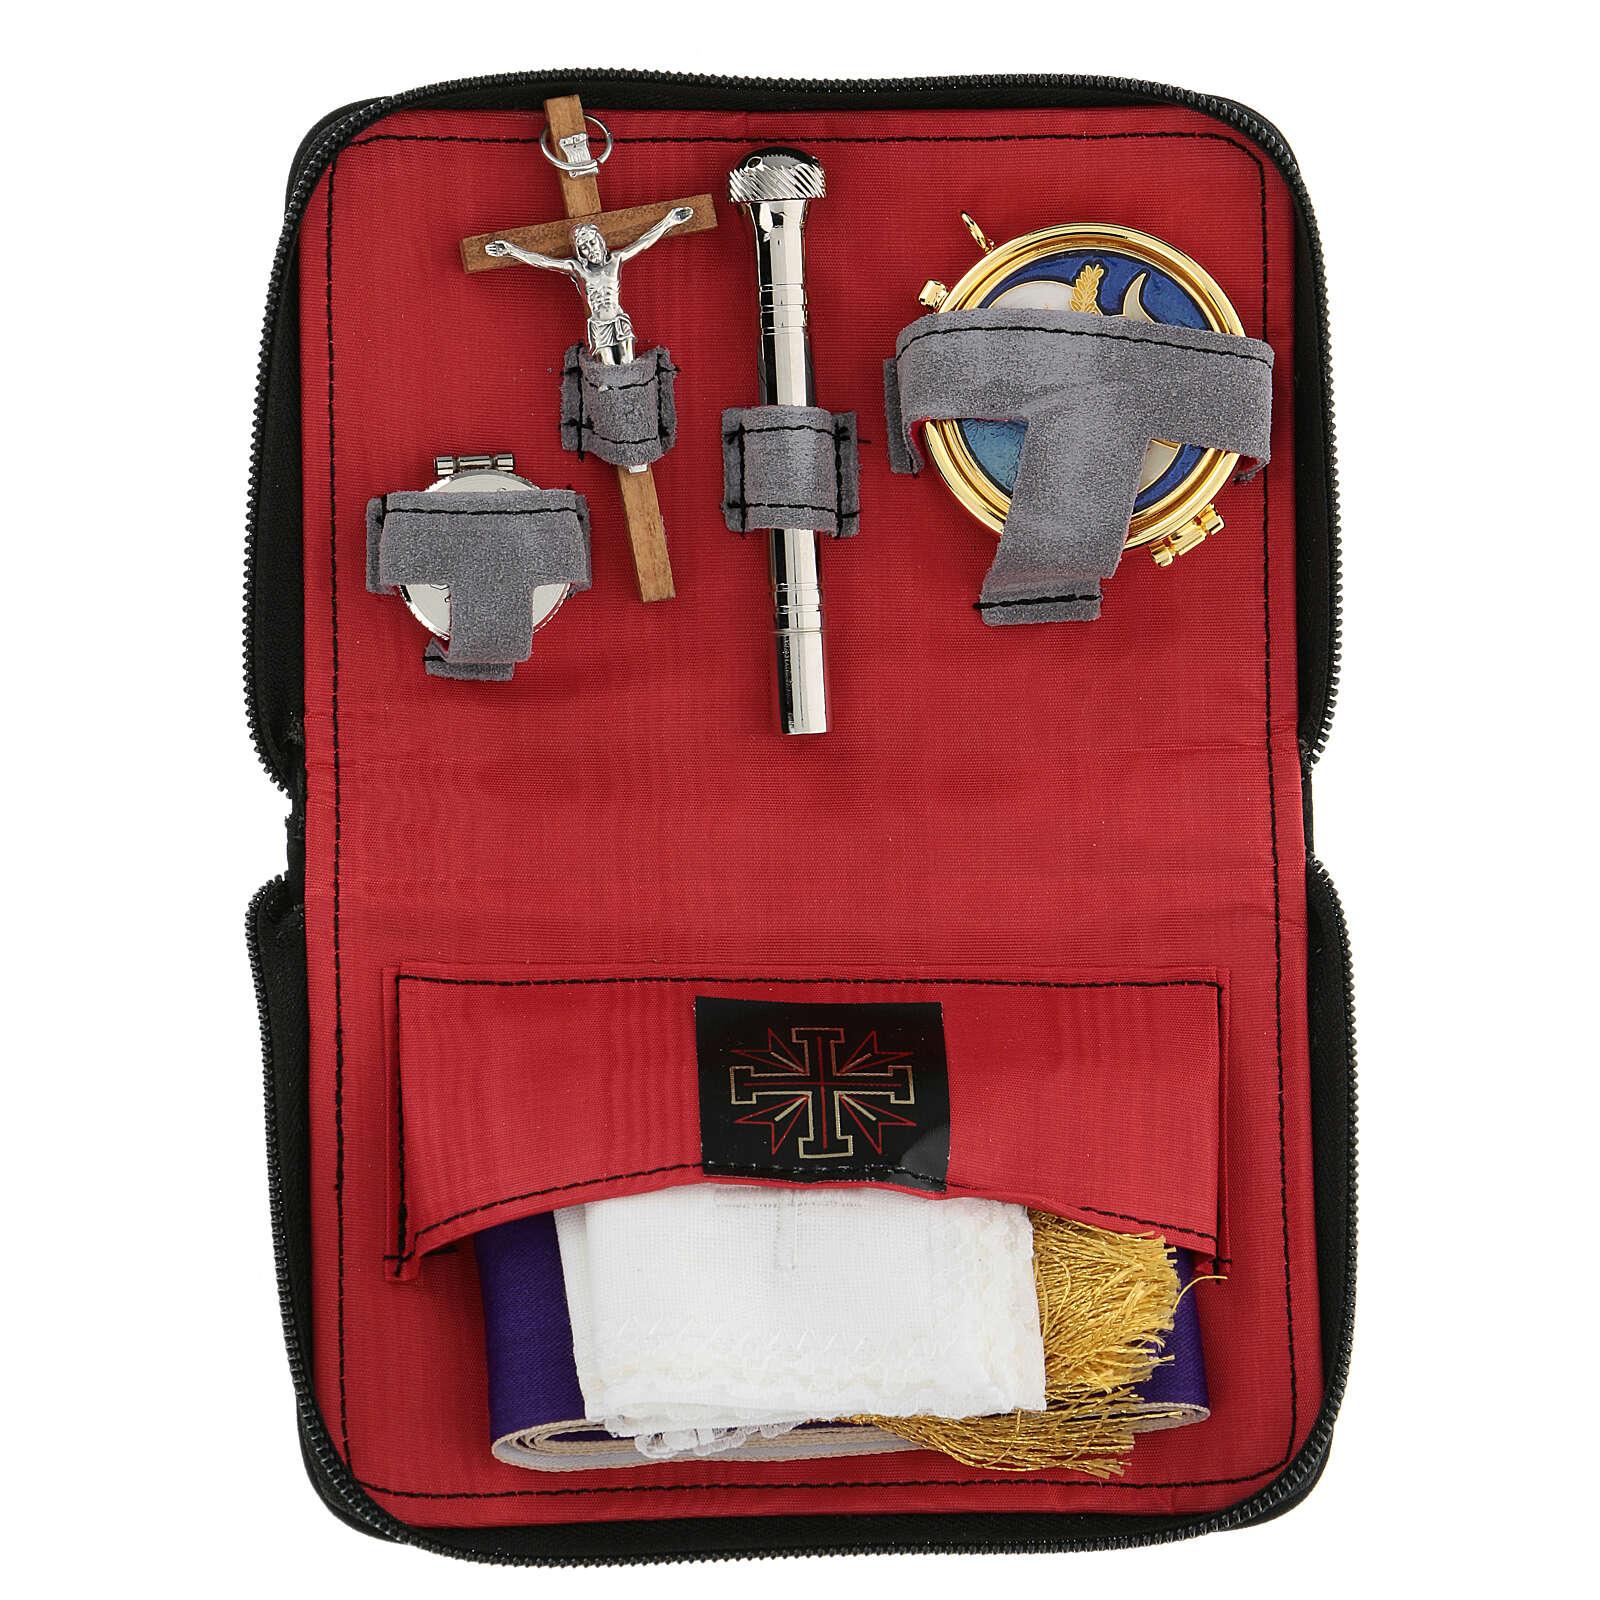 Sick call set leatherette wallet 3